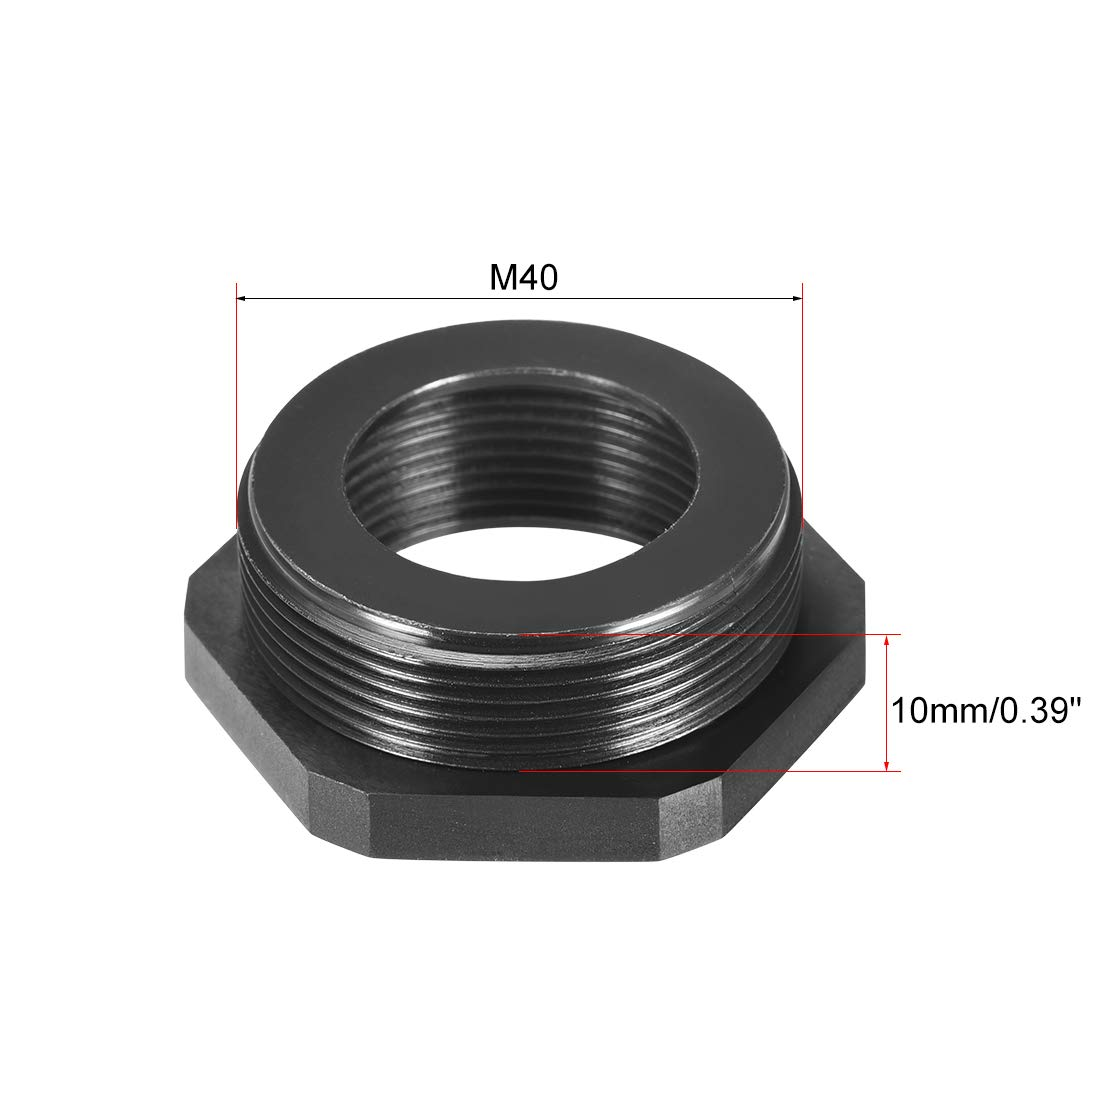 uxcell Threaded Reducing Bushings Nylon Connector Adaptor M40 Male Thread to M32 Female Thread Black